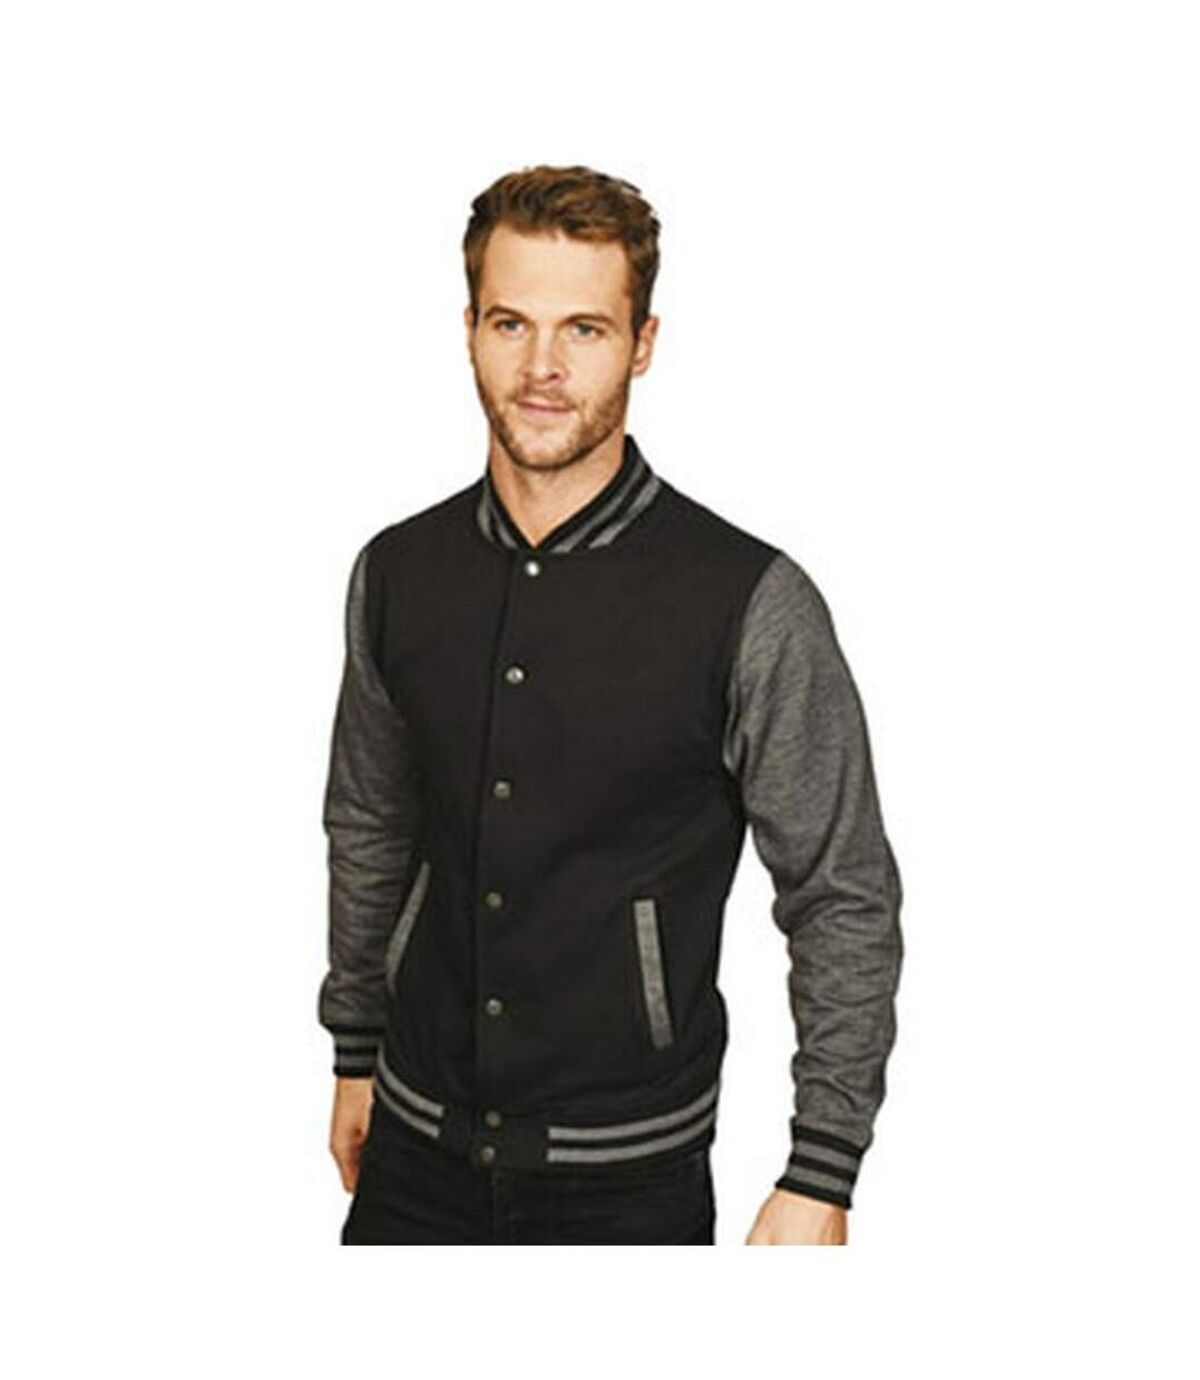 Casual Classic Mens Varsity Jacket (Black/Charcoal) - UTAB454